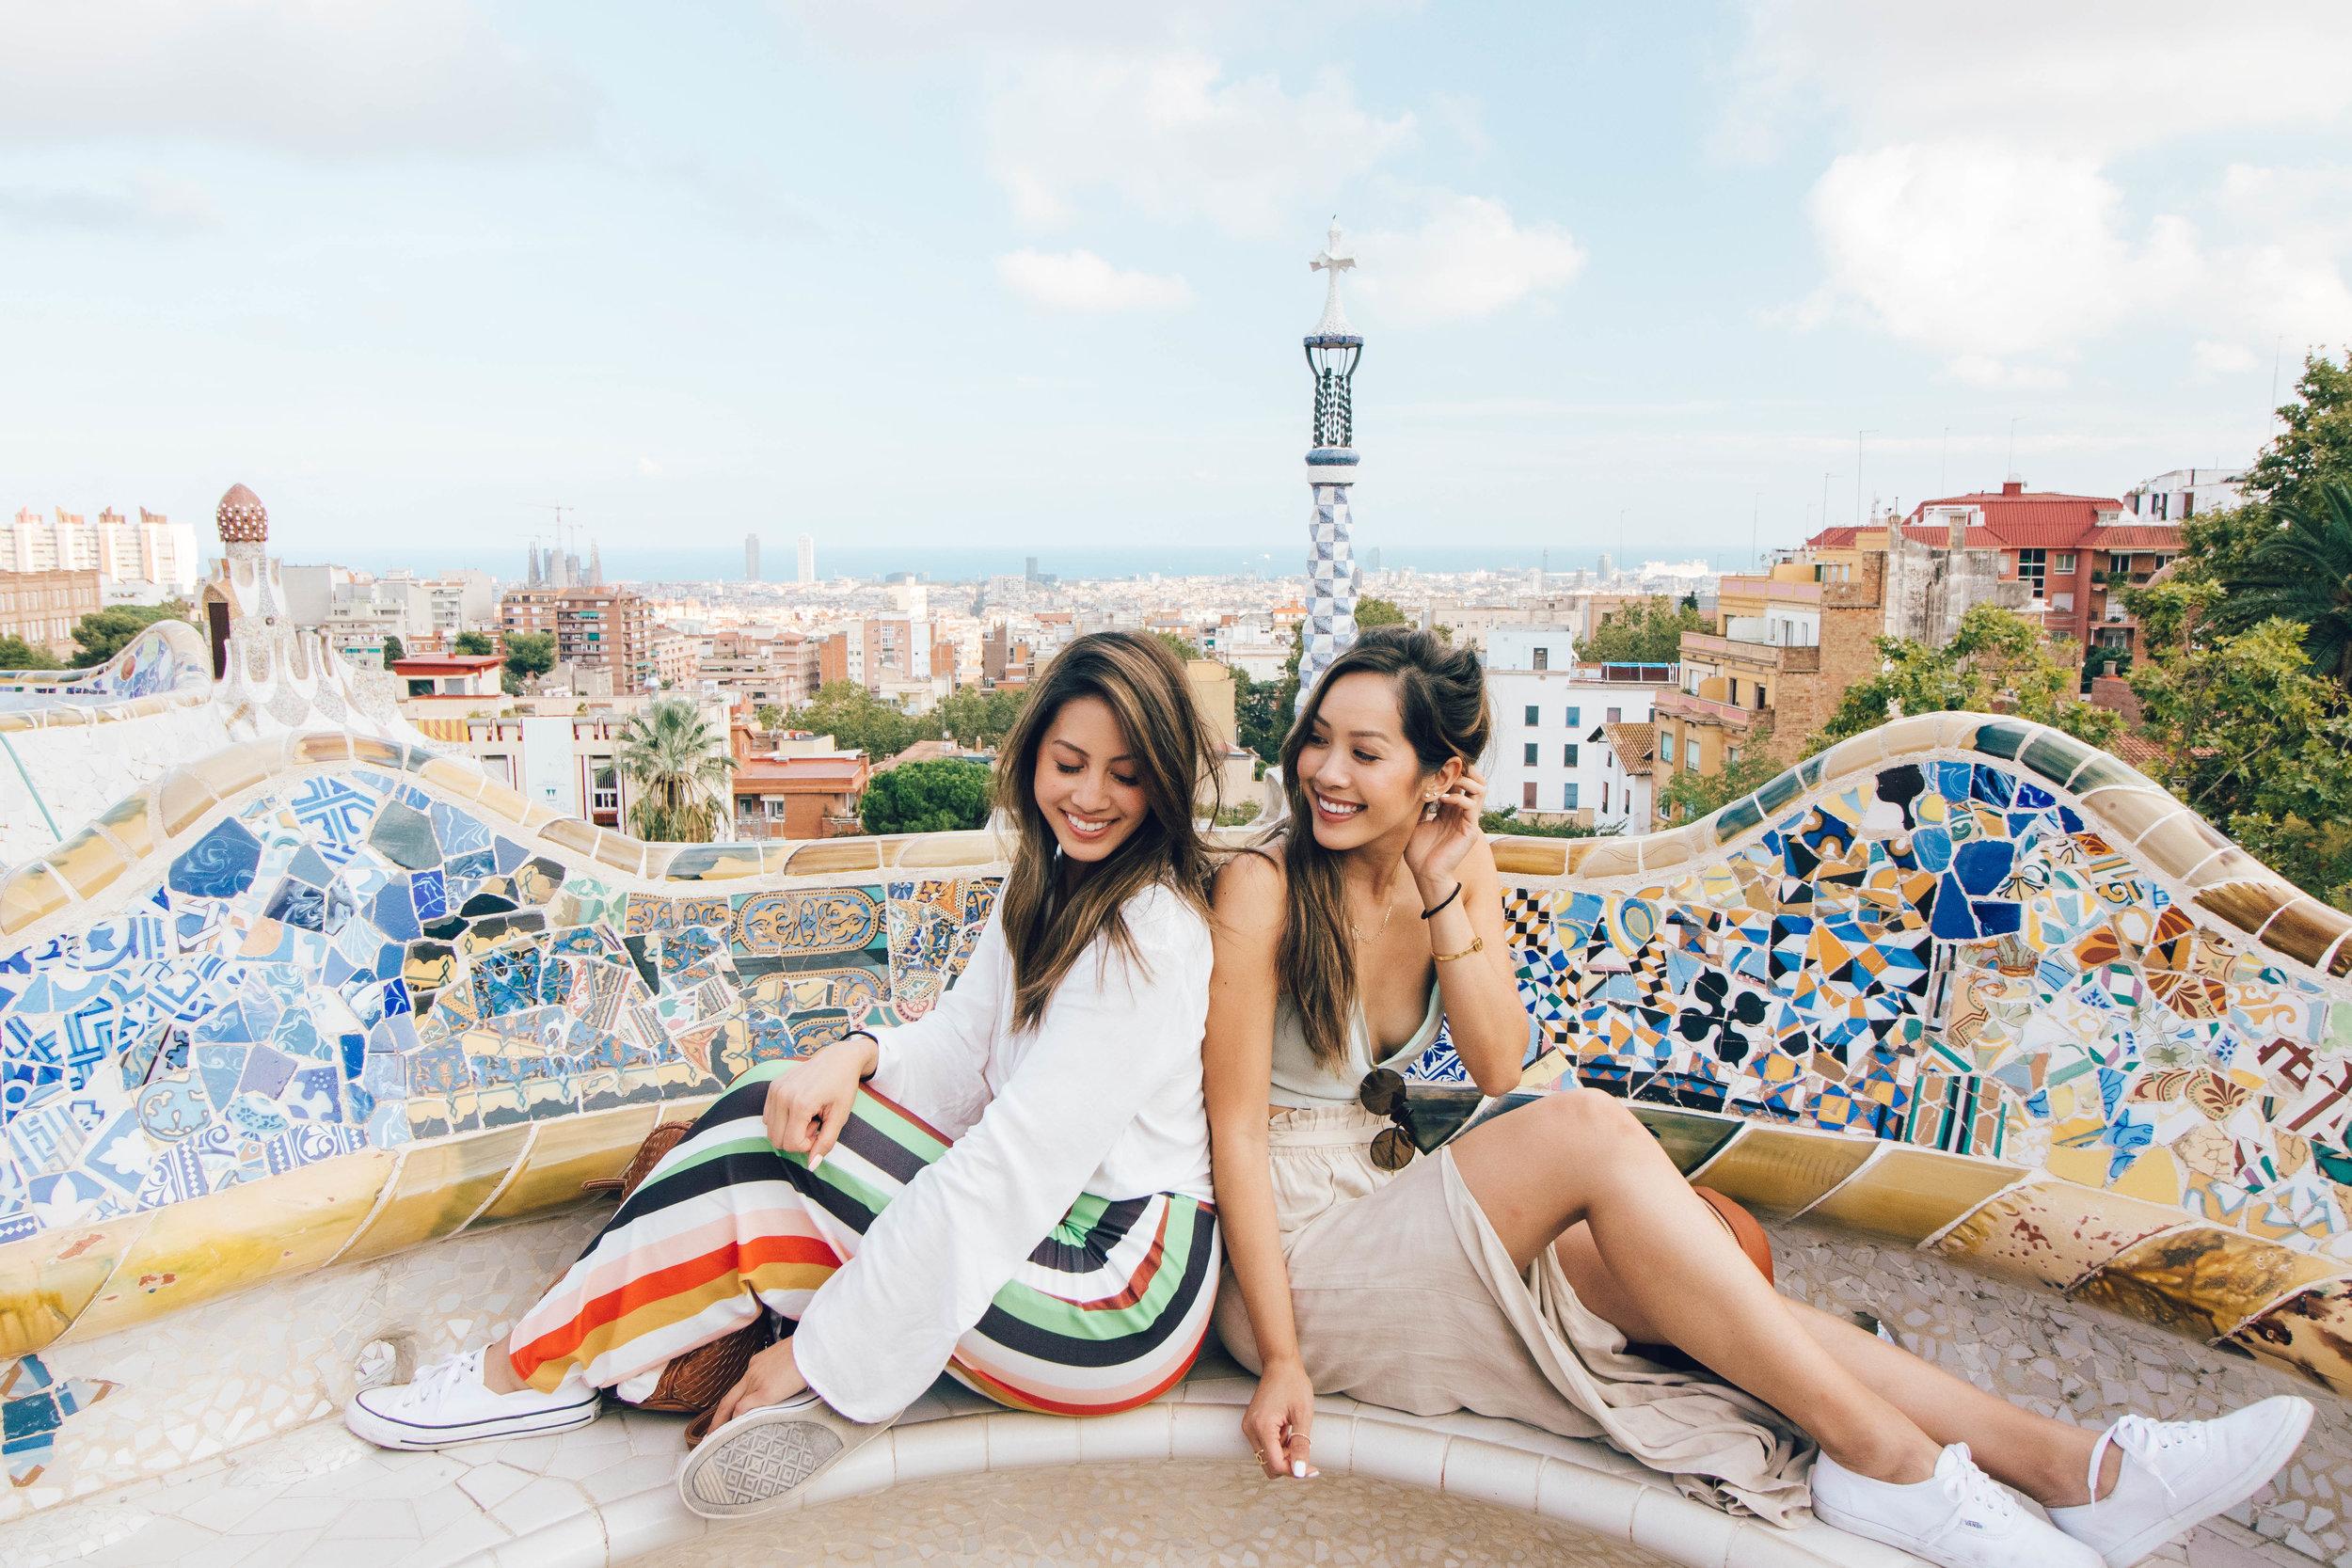 Barcelona Day 2 edits -trish2.jpg